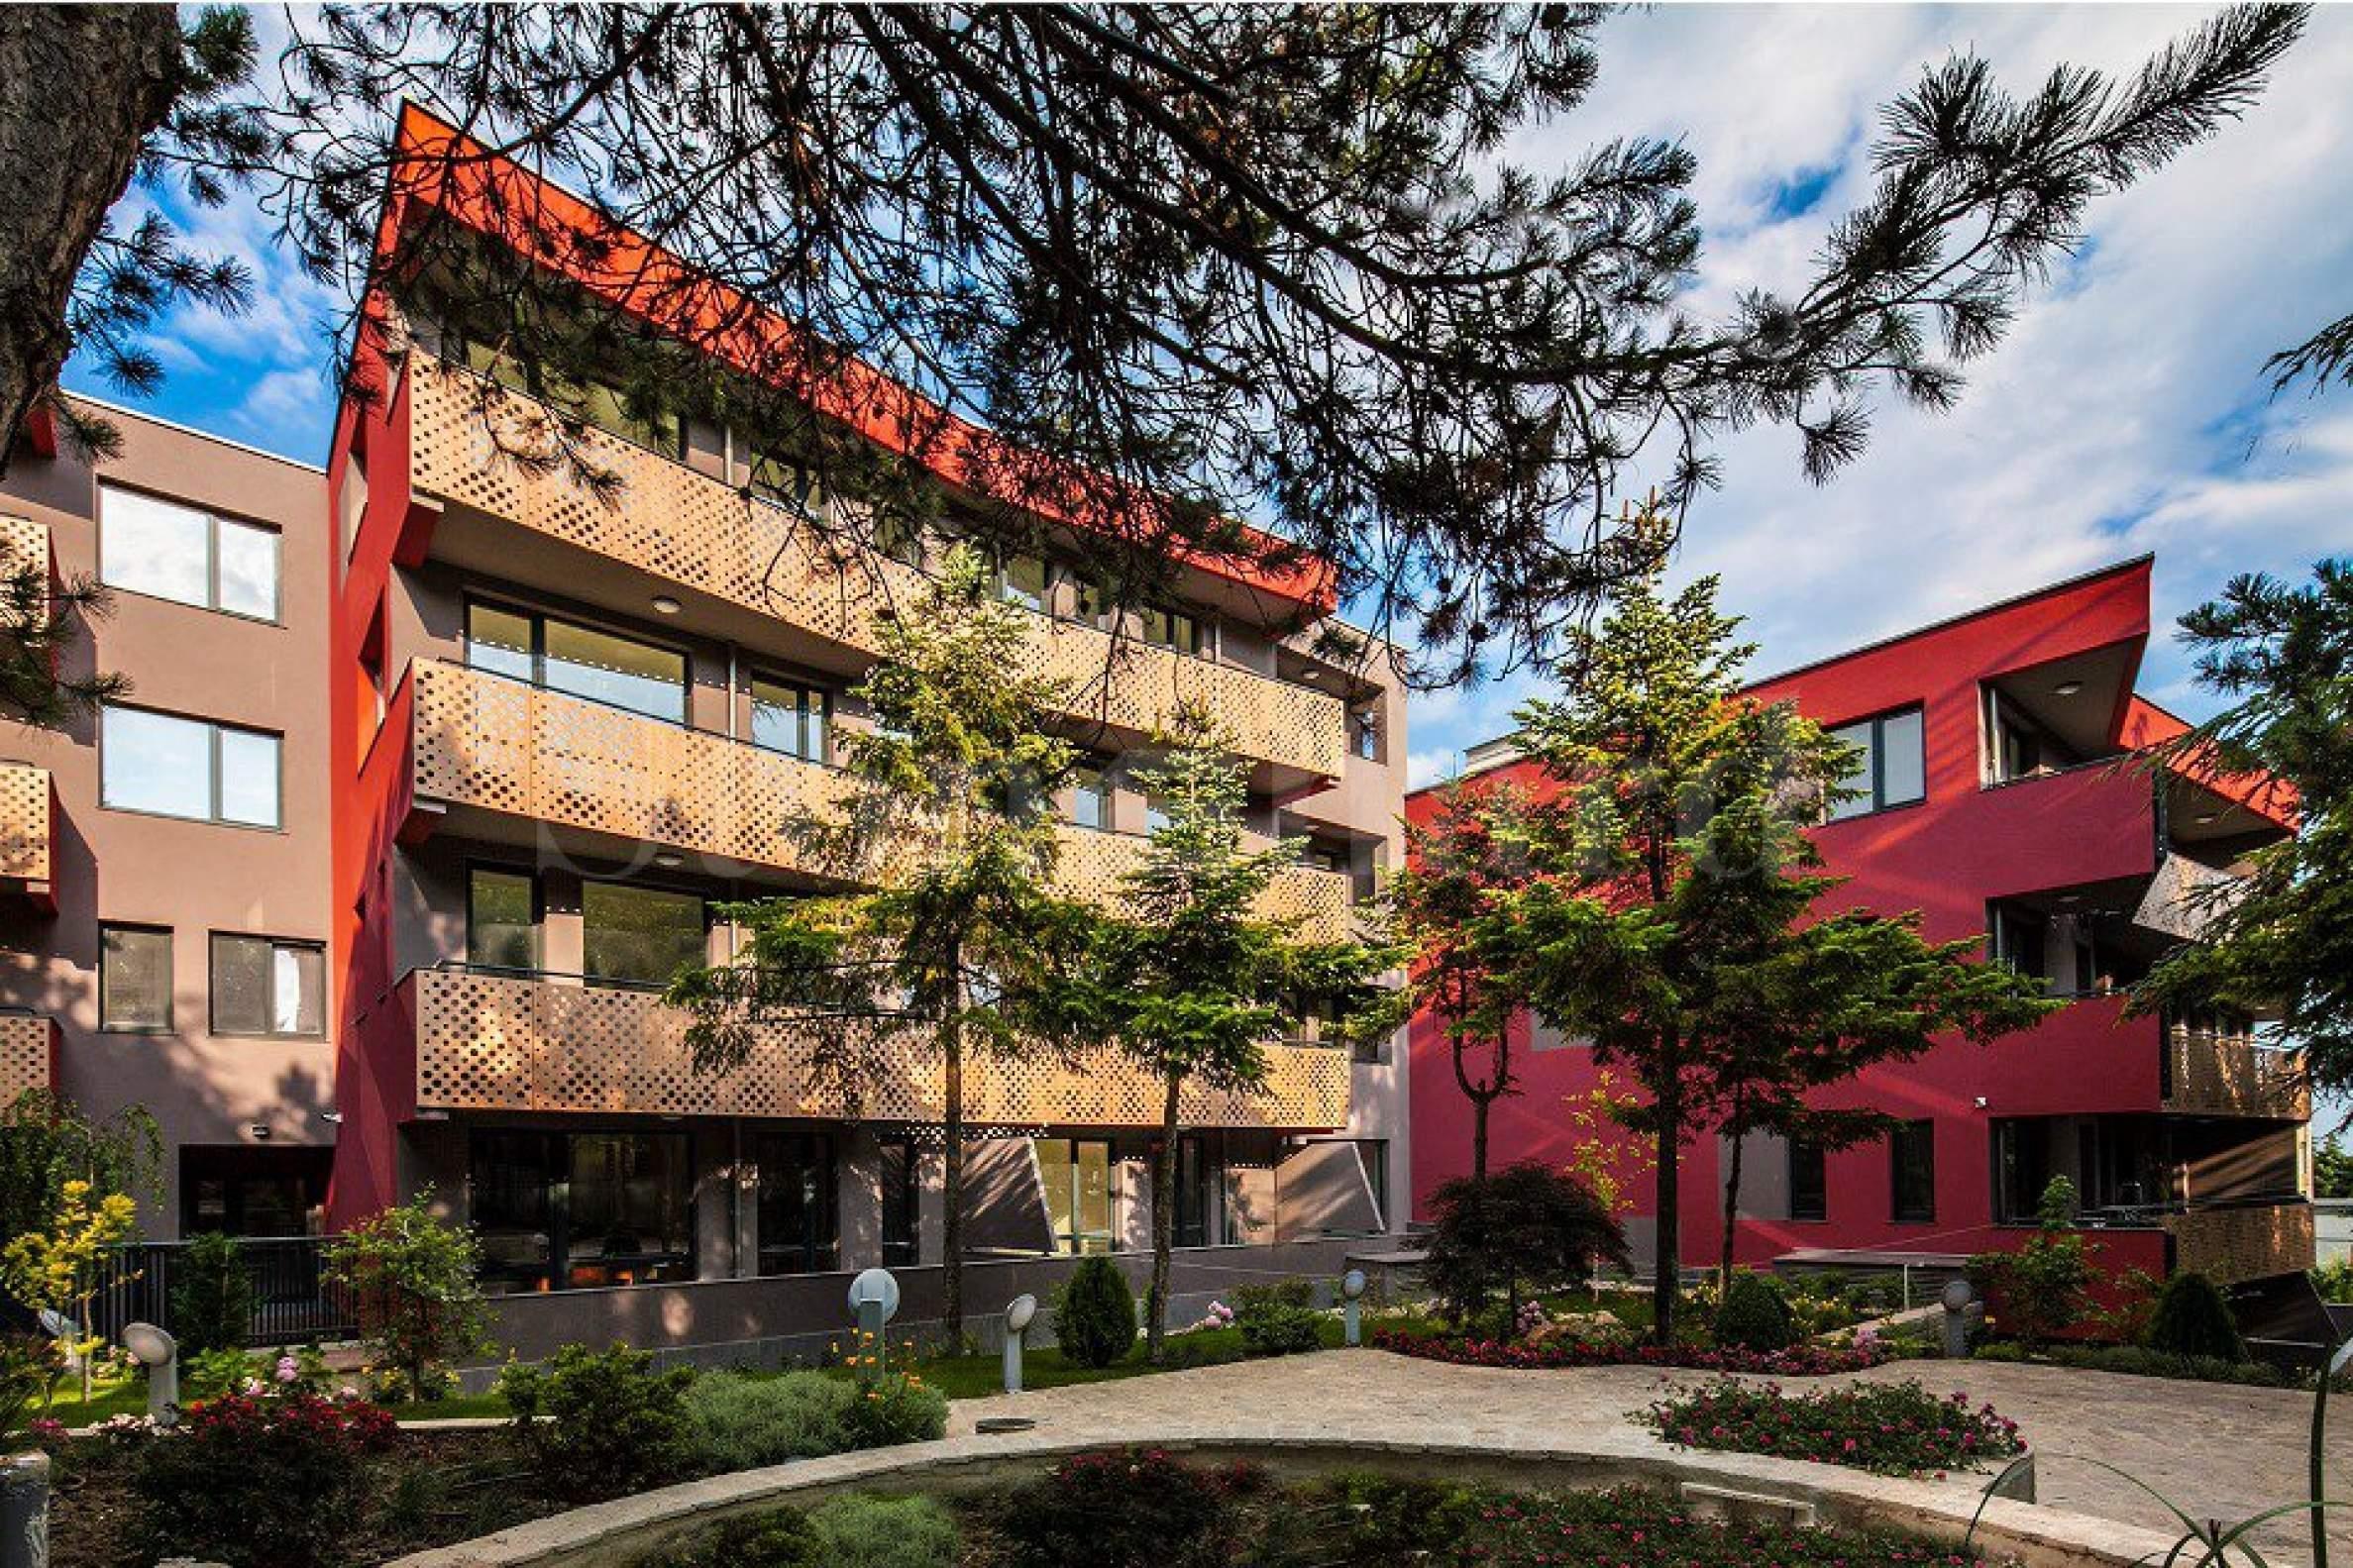 Нови апартаменти в затворен комплекс в кв. Бриз1 - Stonehard